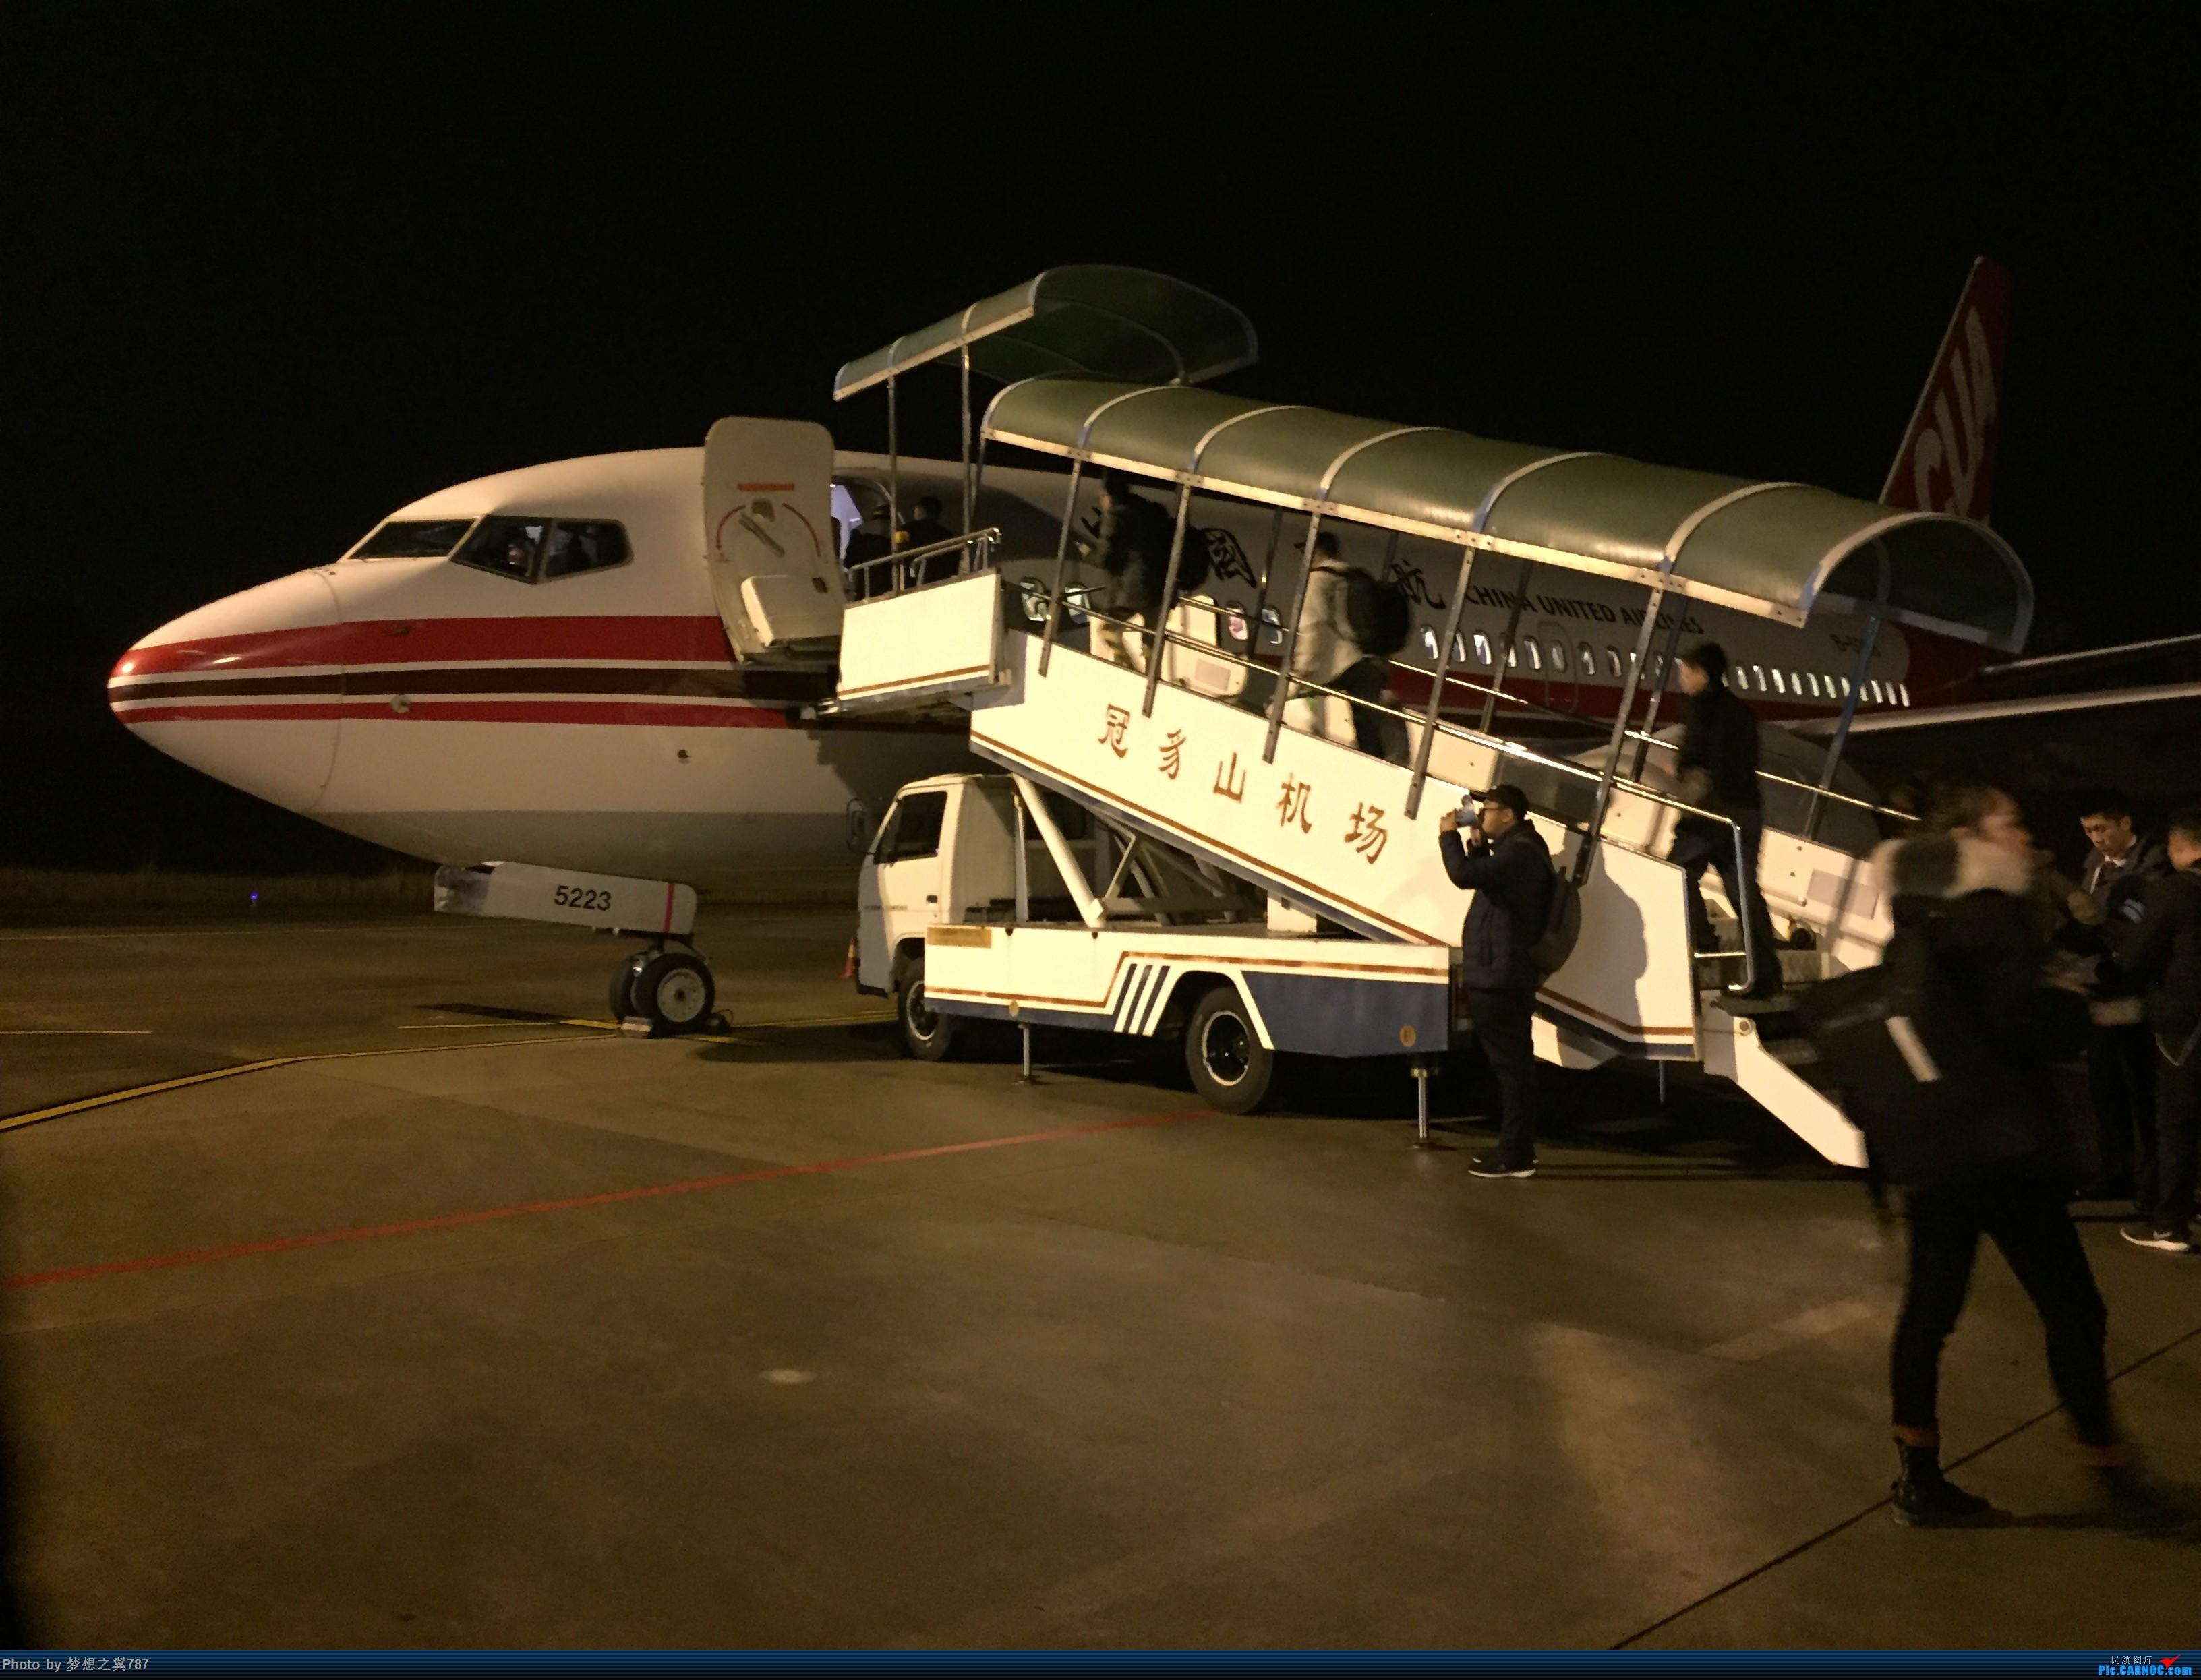 Re:中国联合航空 佛山-连城 往返 BOEING 737-700 B-5223 中国福建龙岩冠豸山机场